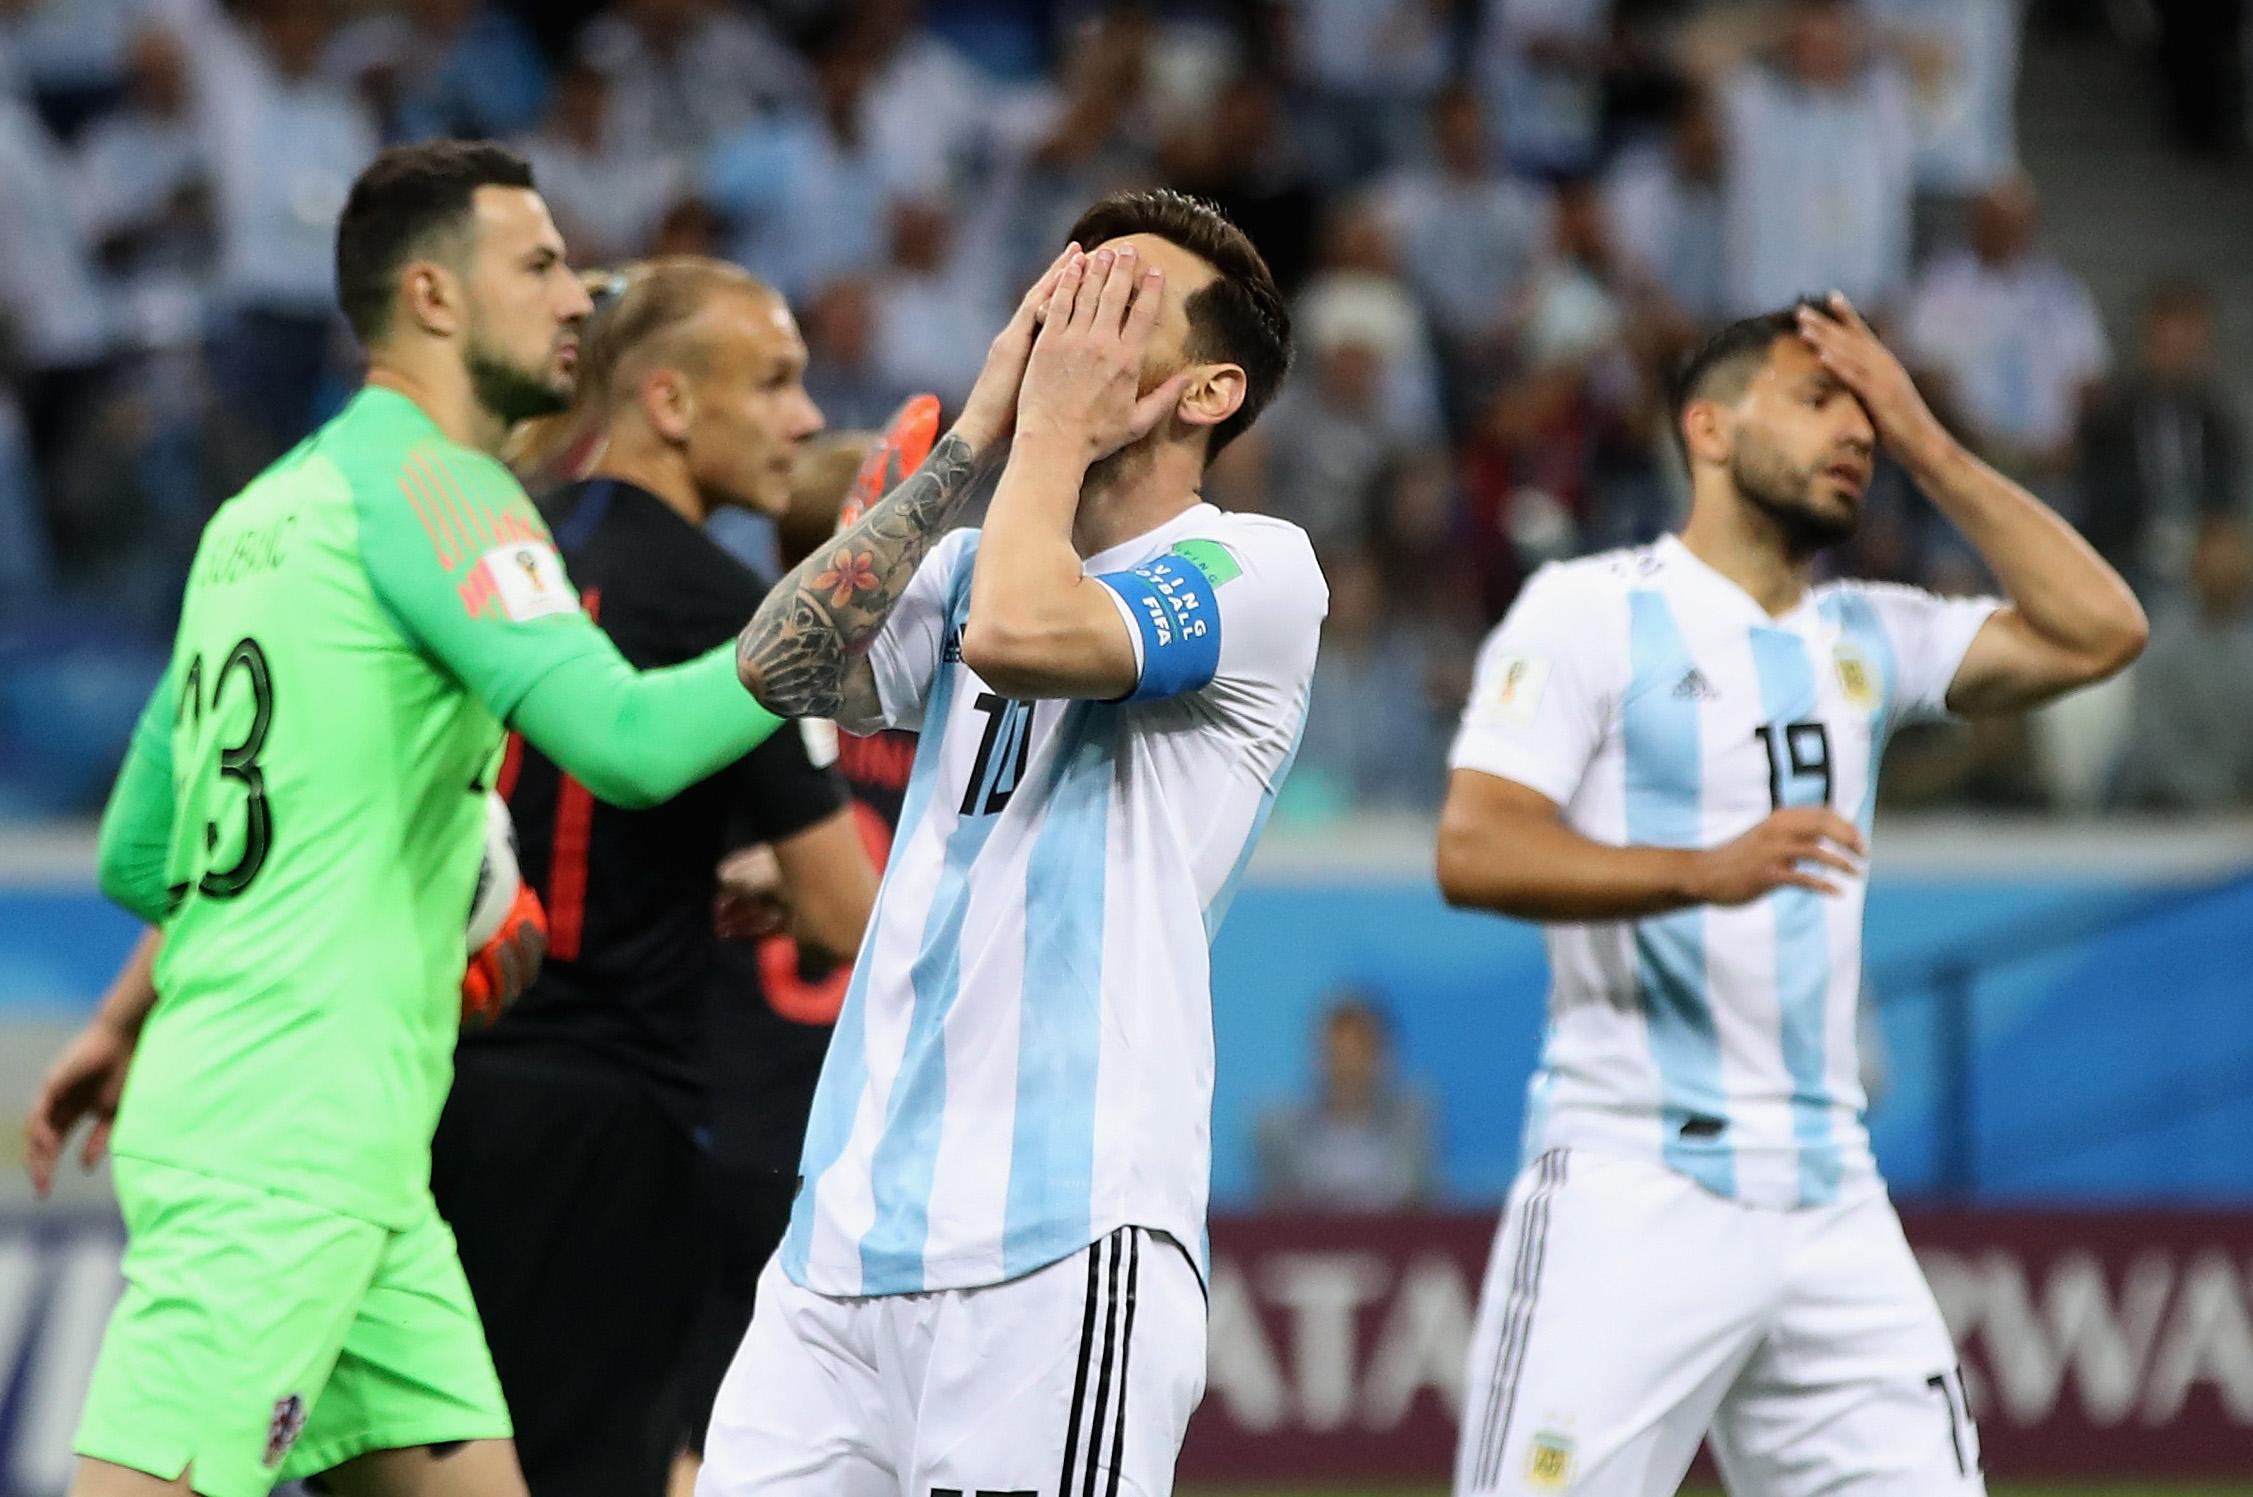 Prensa Argentina, Sampaoli, Messi, Argentina